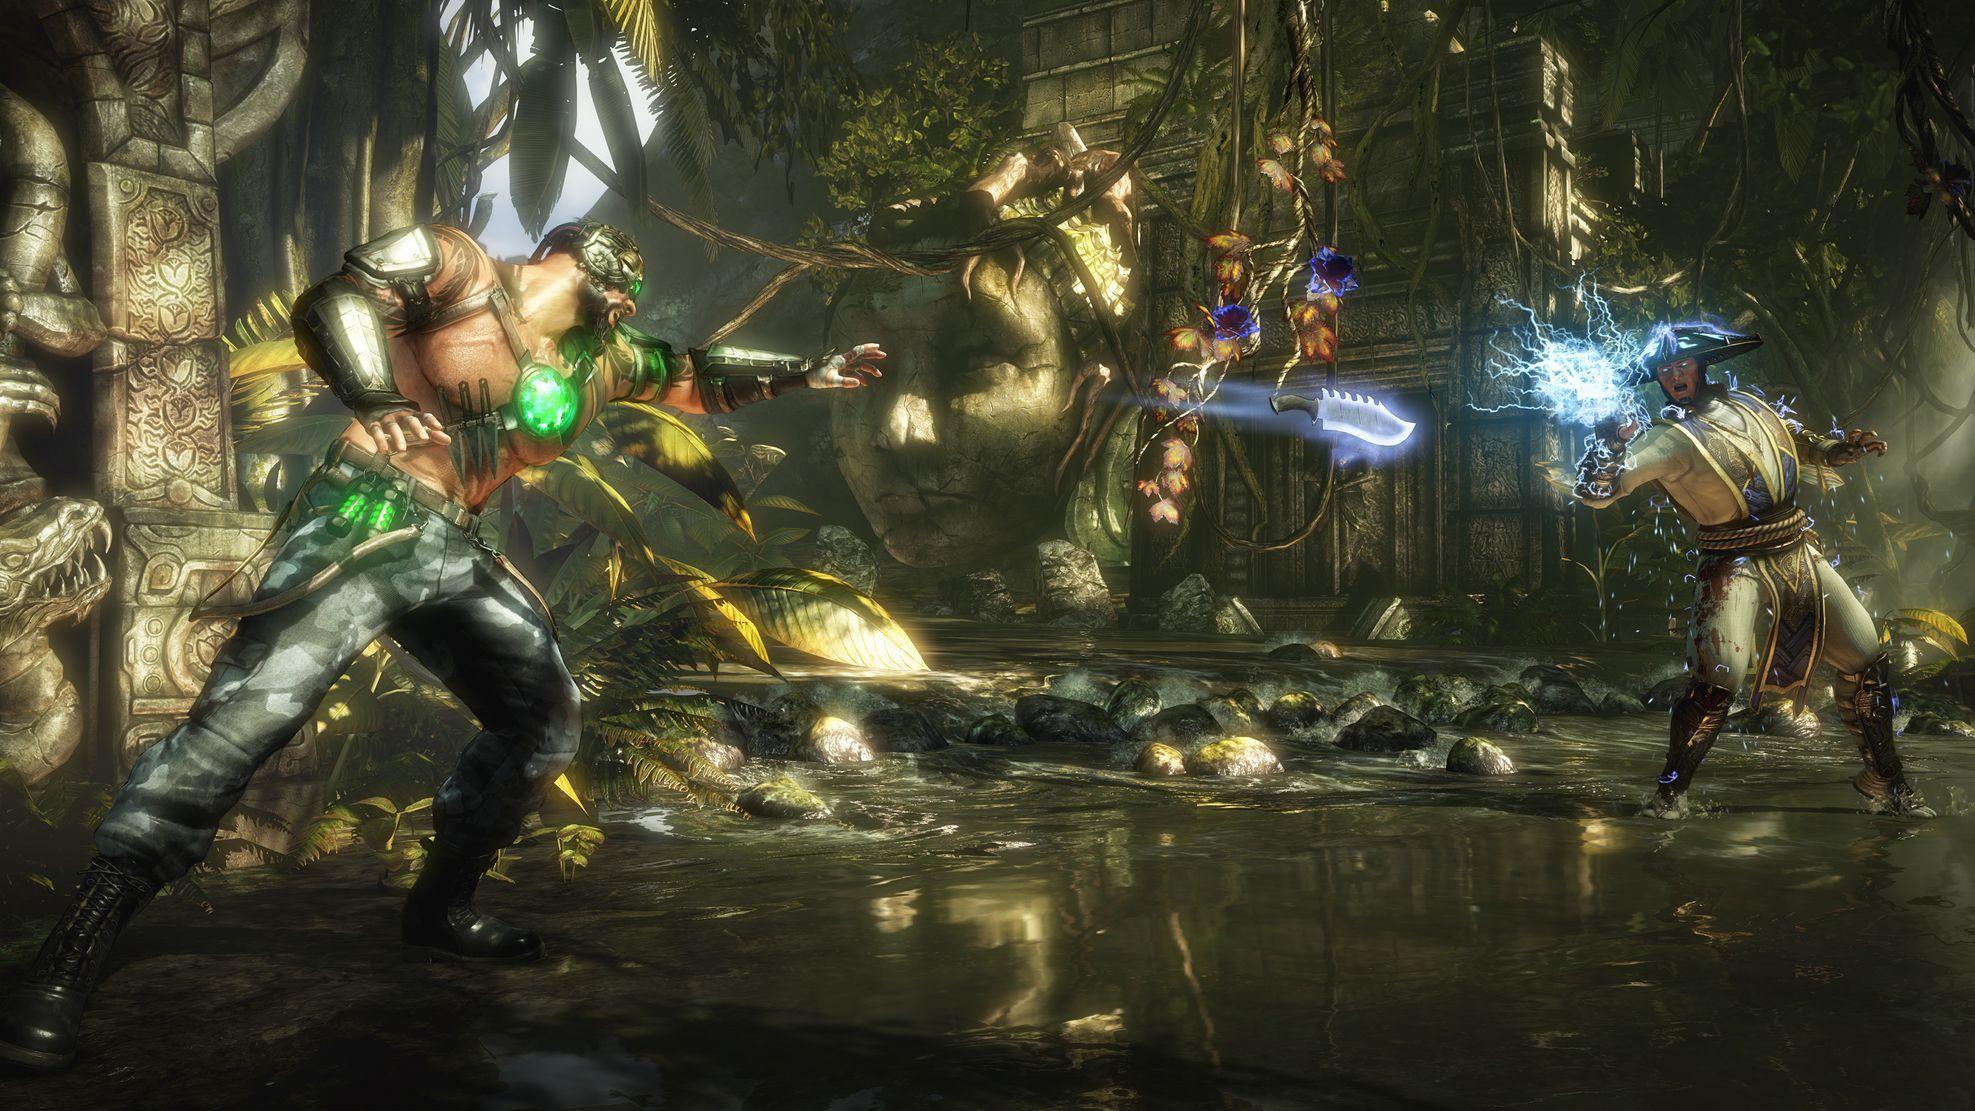 Mortal Kombat X (Xbox One) - 6